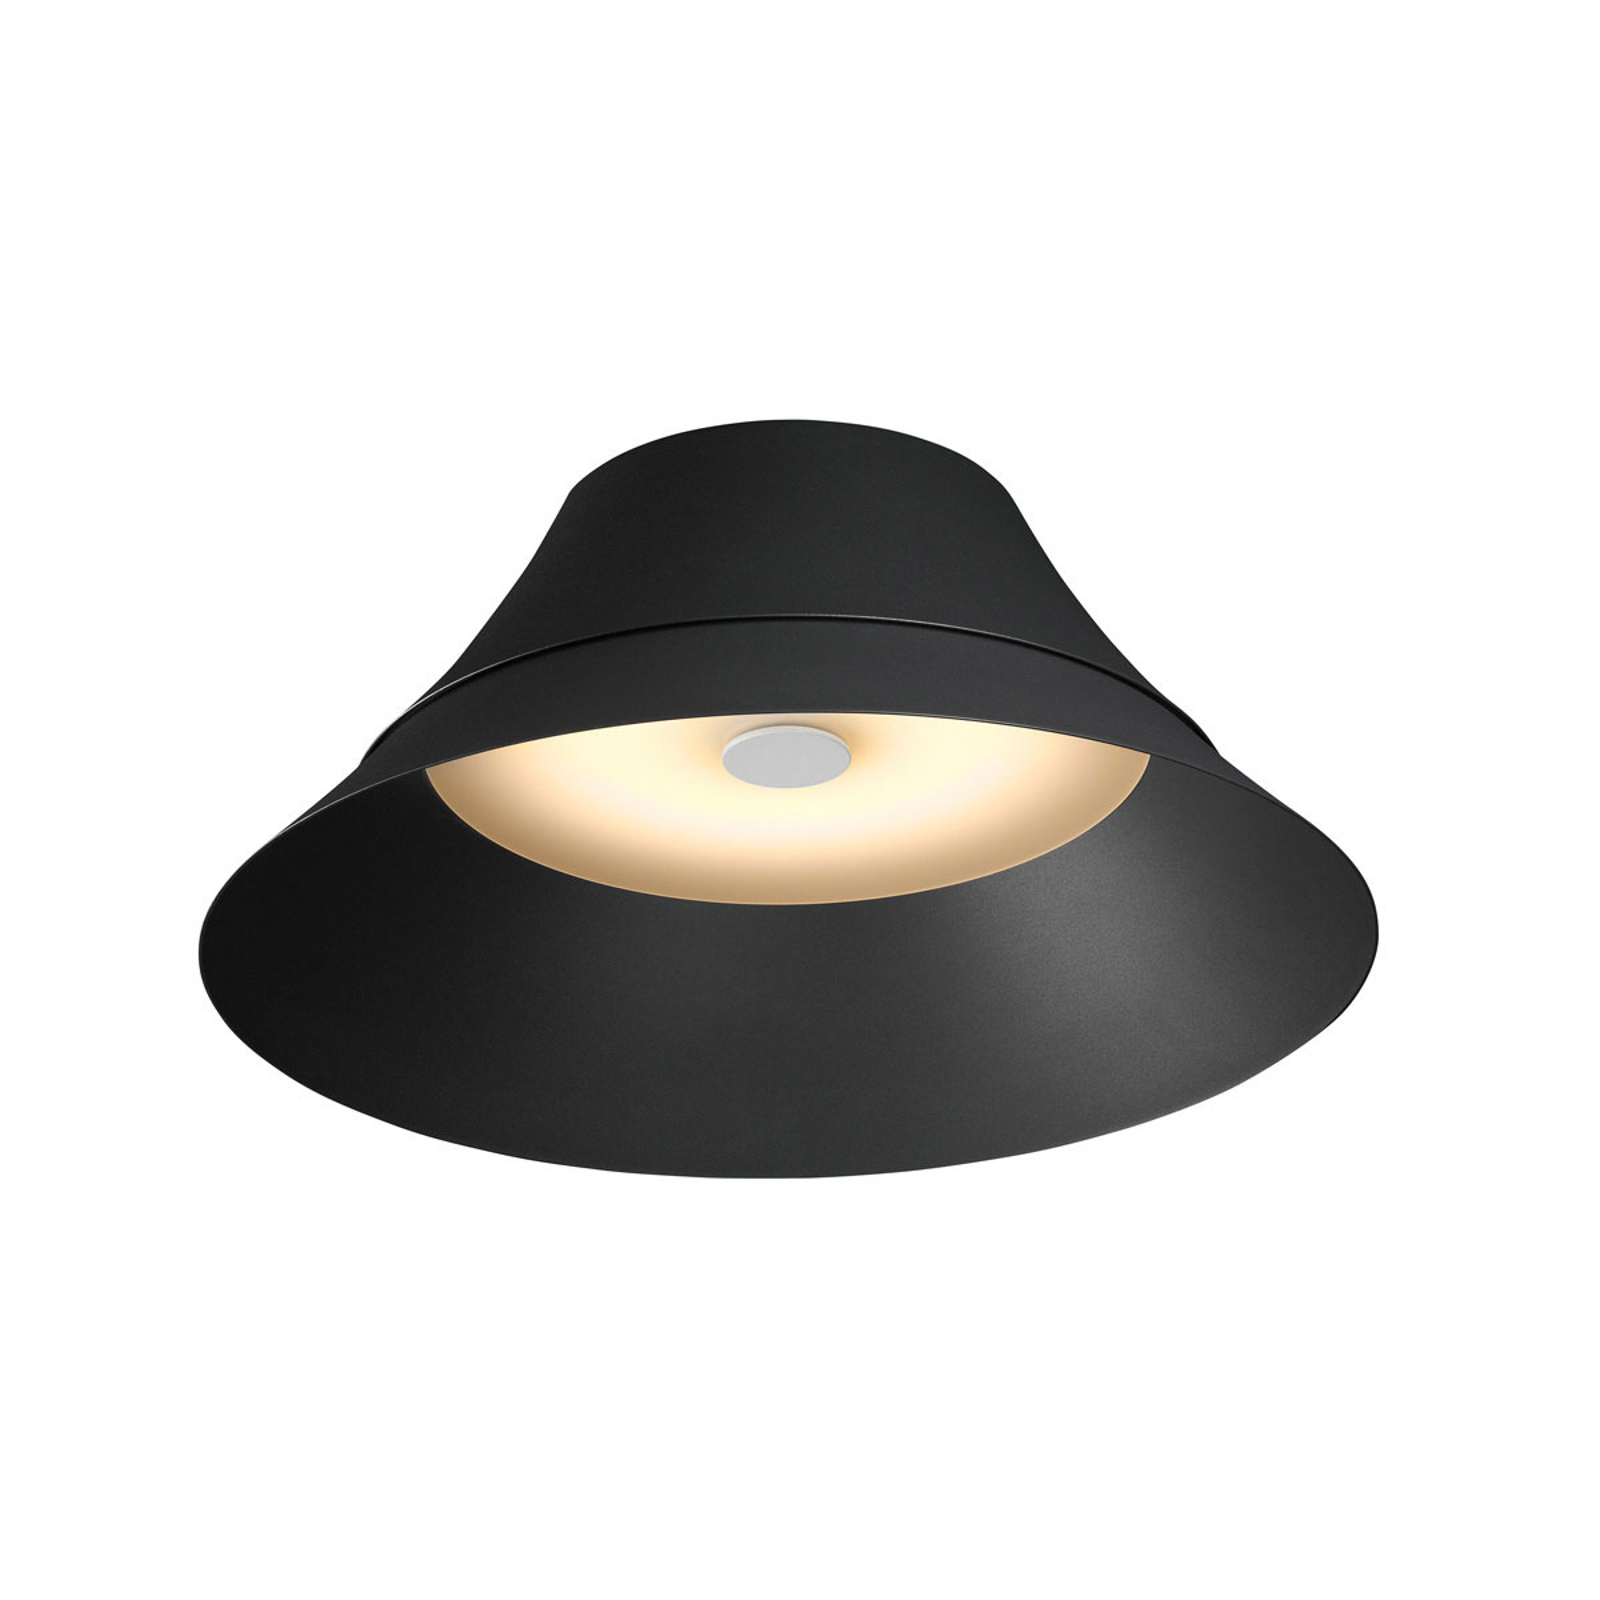 SLV Bato 45 LED-taklampe, svart